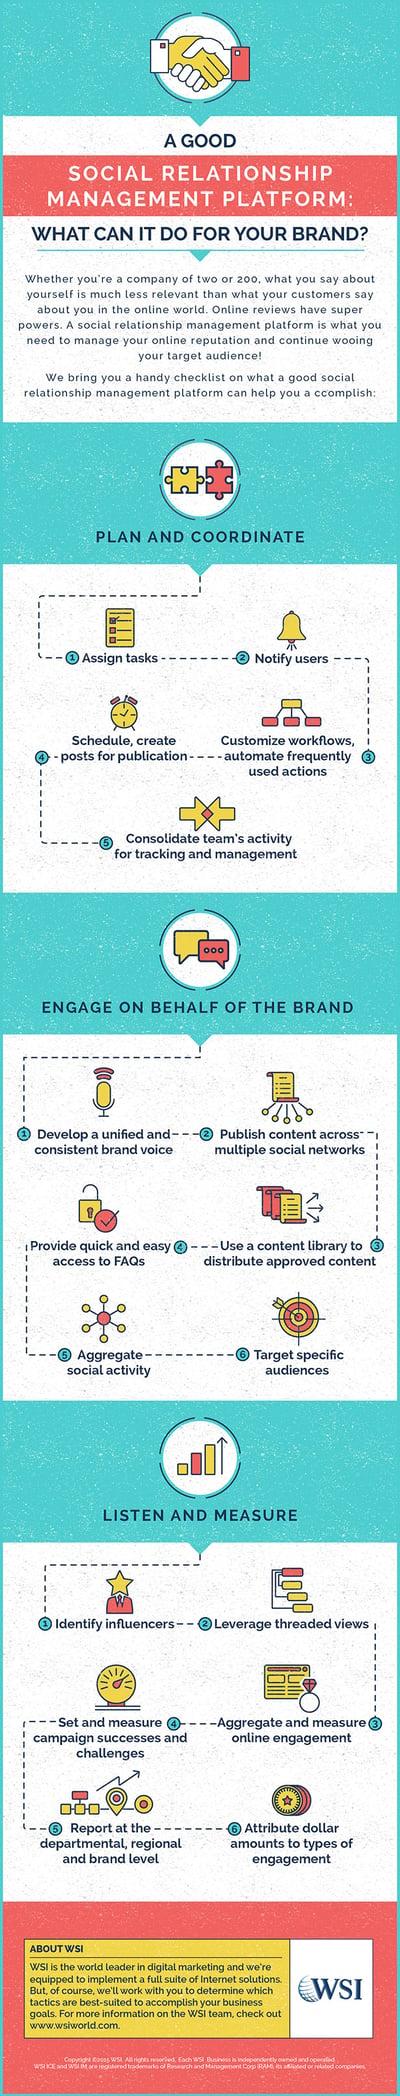 A Good Social Relationship Management Platform Infographic (FULL)